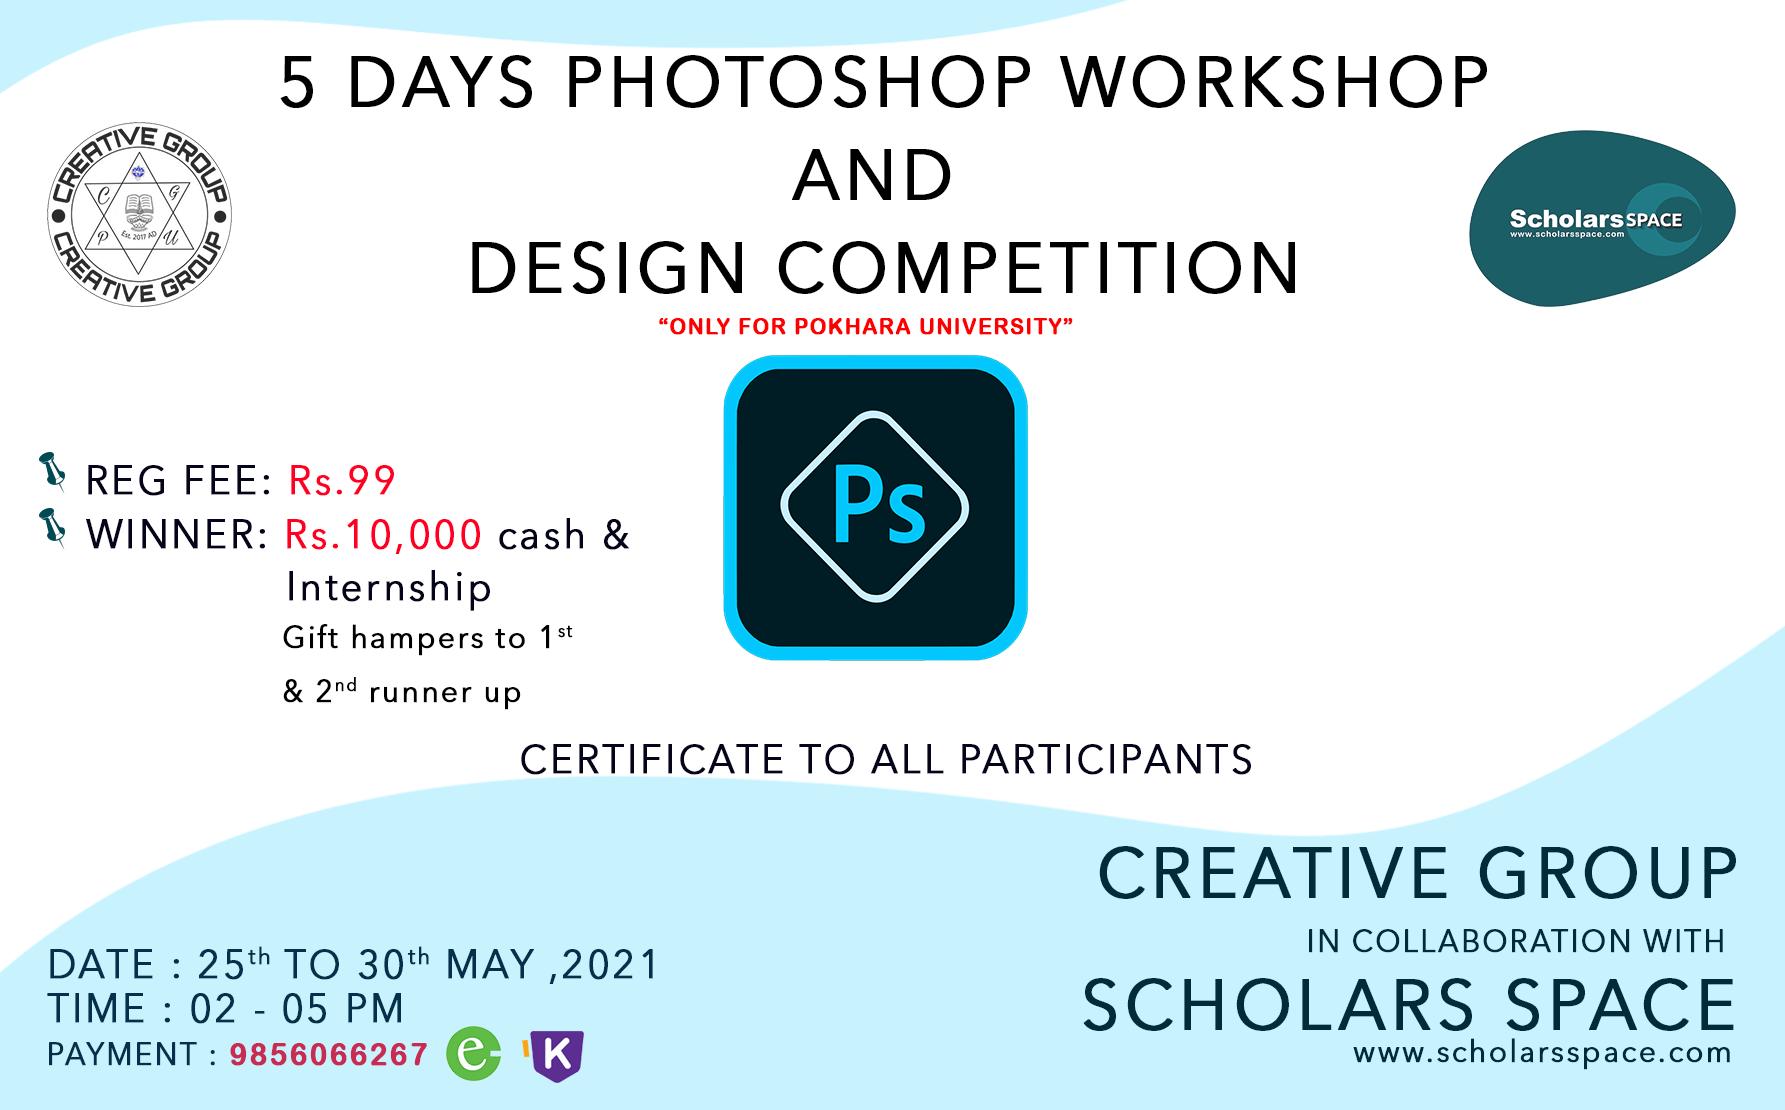 5 Days Photoshop Workshop and Design Competition Pokhara University